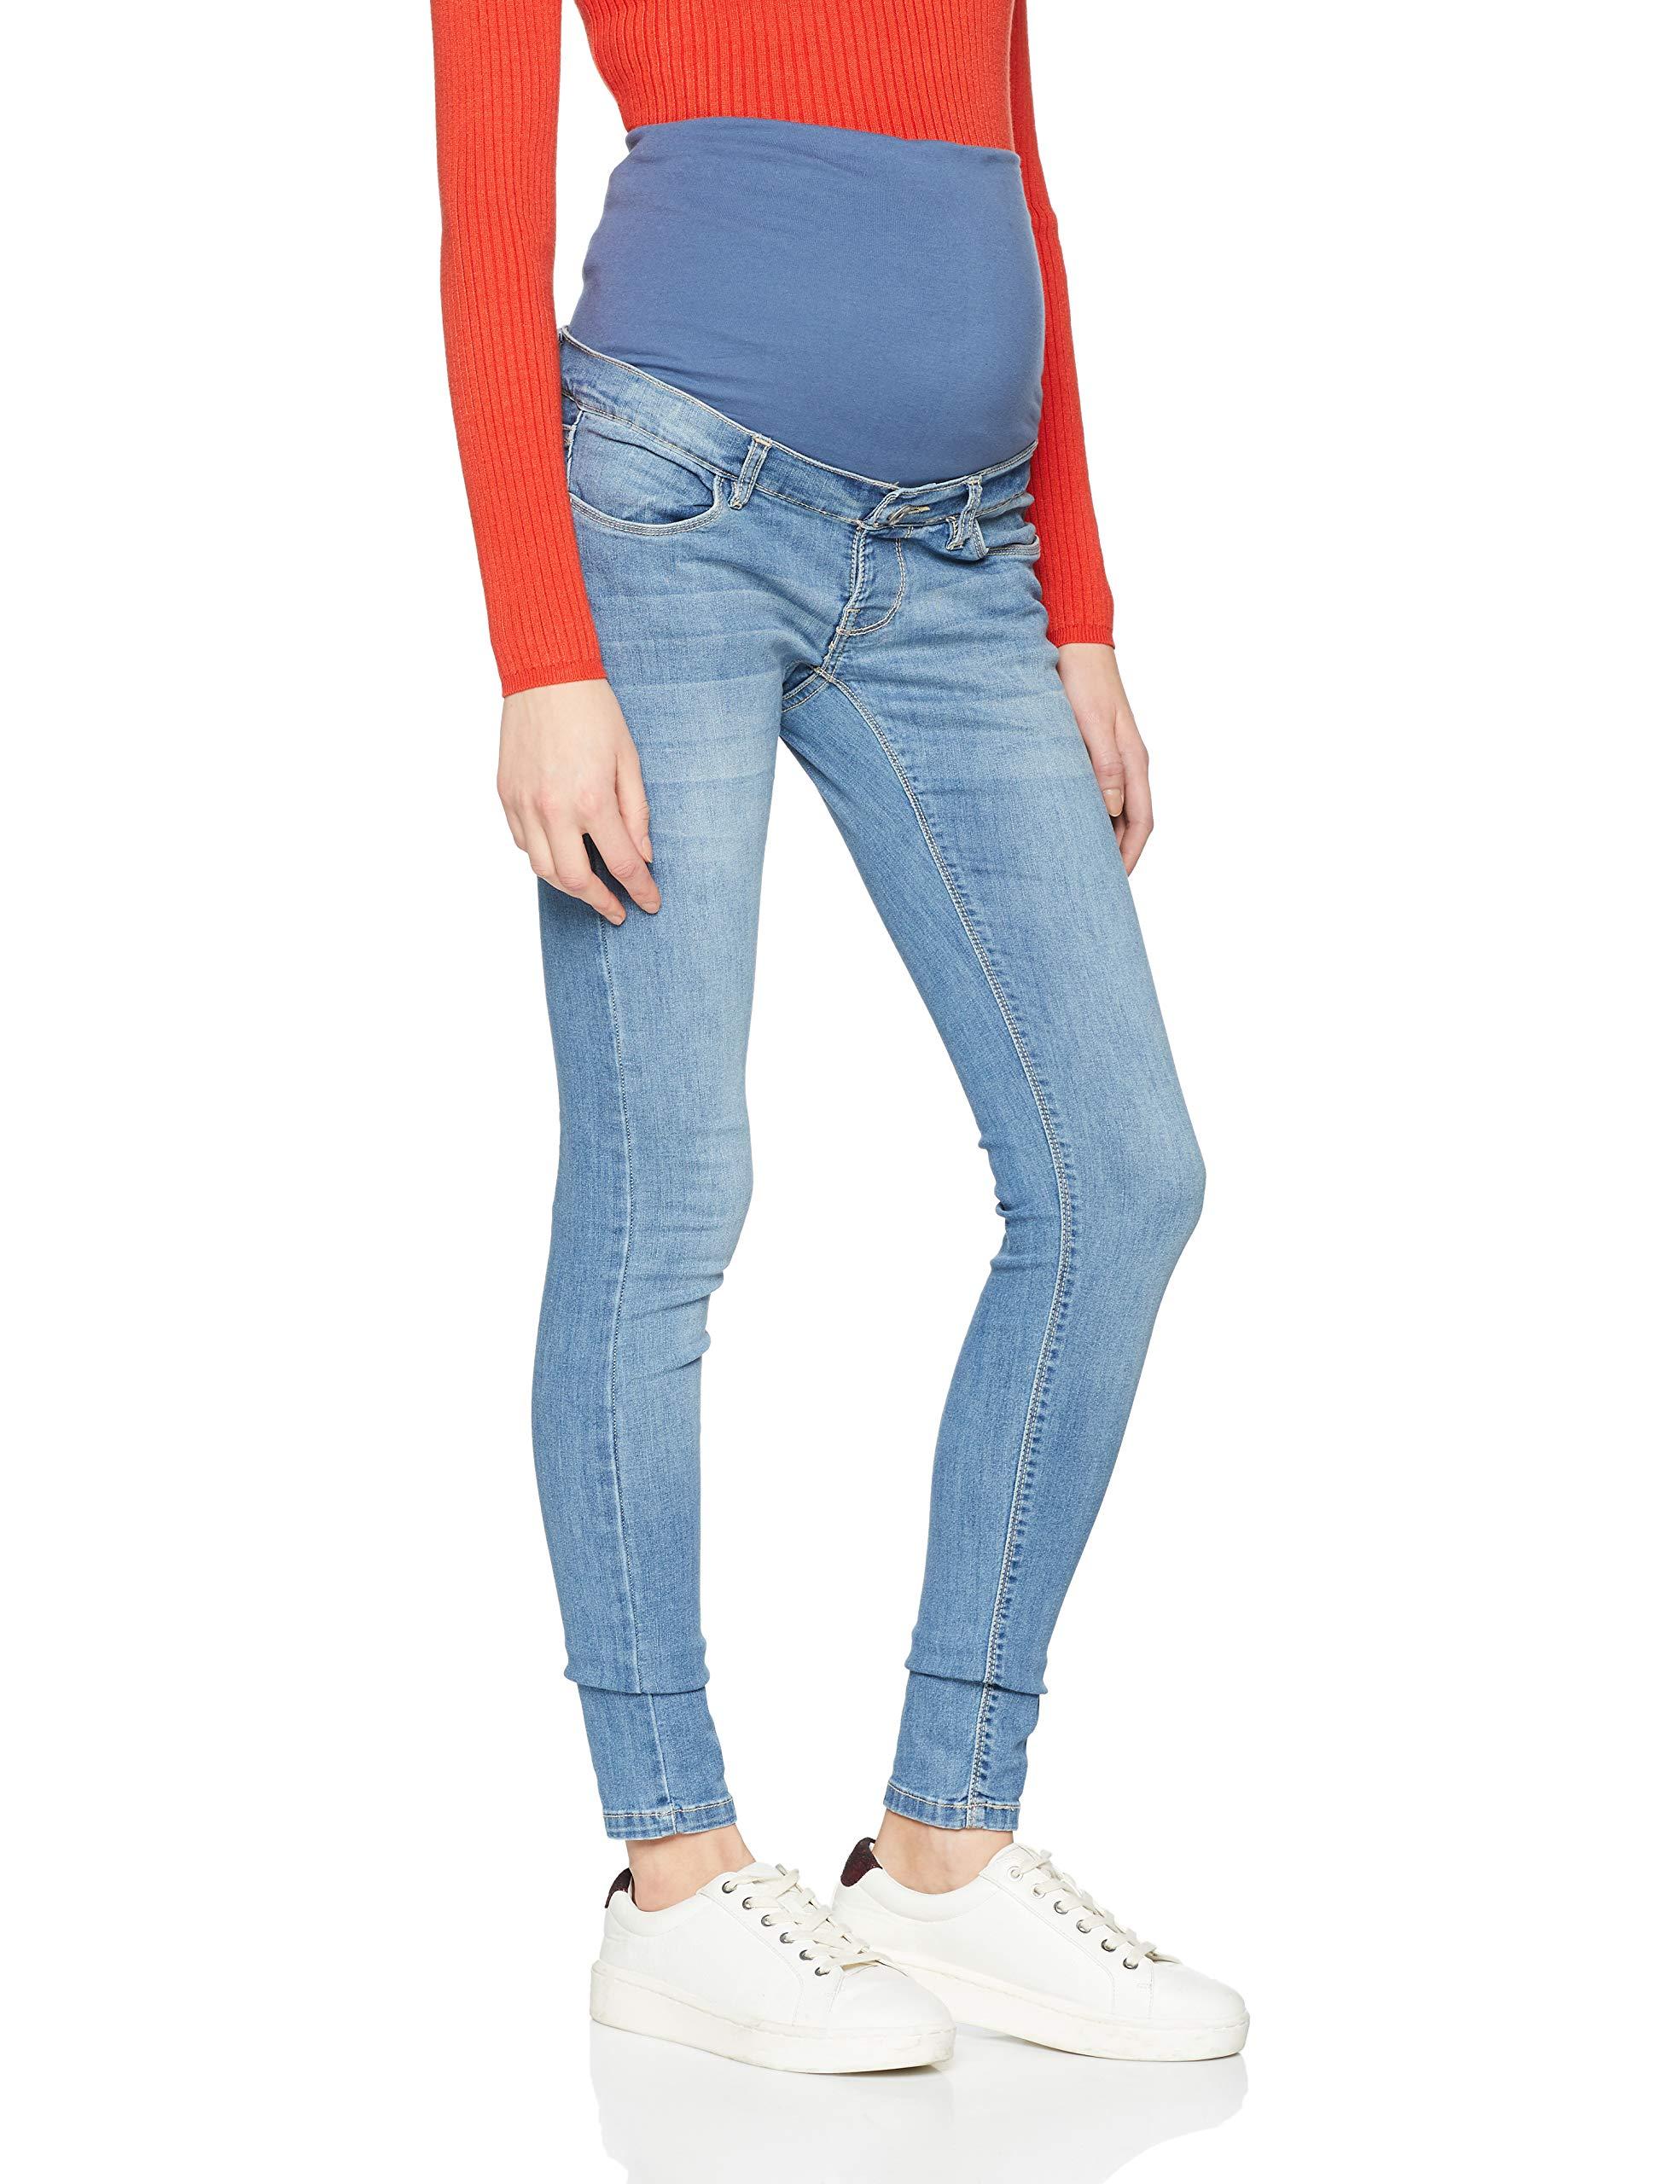 Jeans 32l MaternitéBleu P14429w Noppies X Femme Skinny Blue Avi Aged Otb E2IeHYWD9